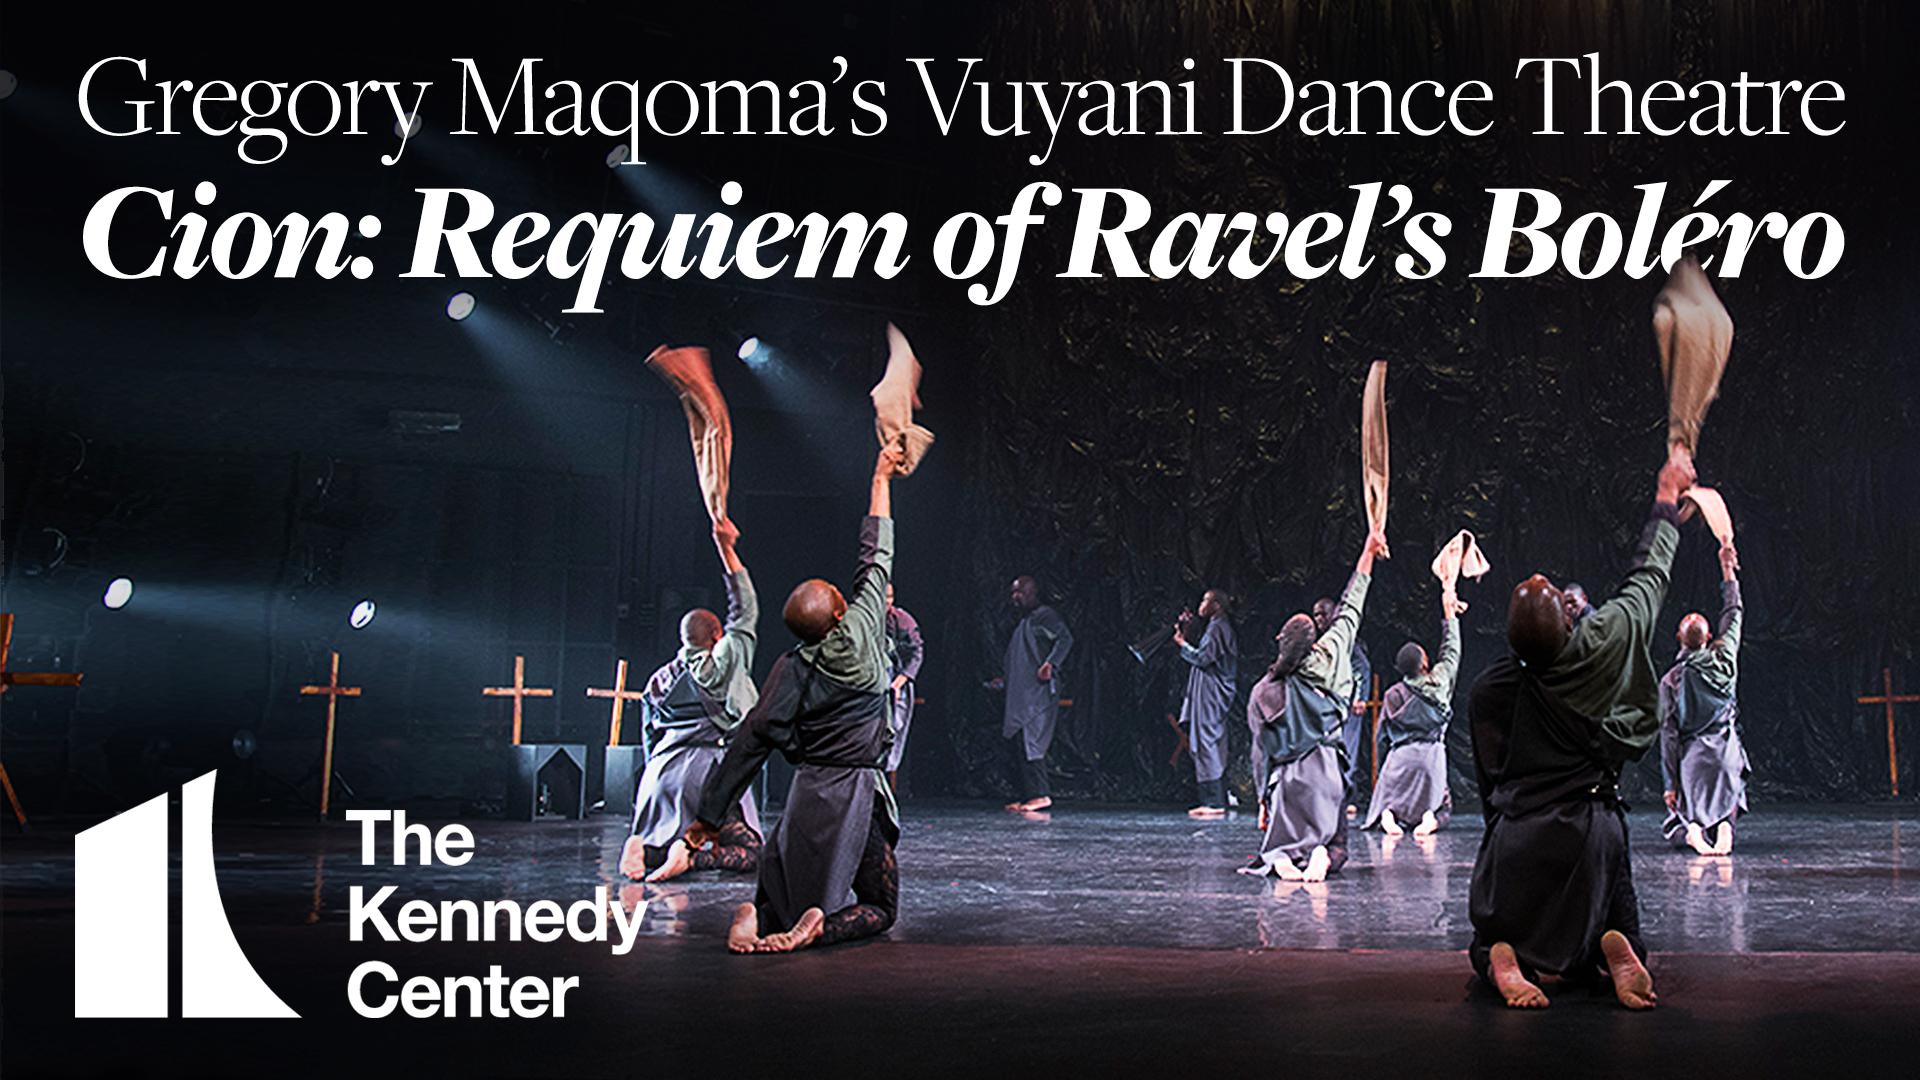 Gregory Maqoma's Vuyani Dance Theatre: Cion: Requiem of Ravel's Boléro